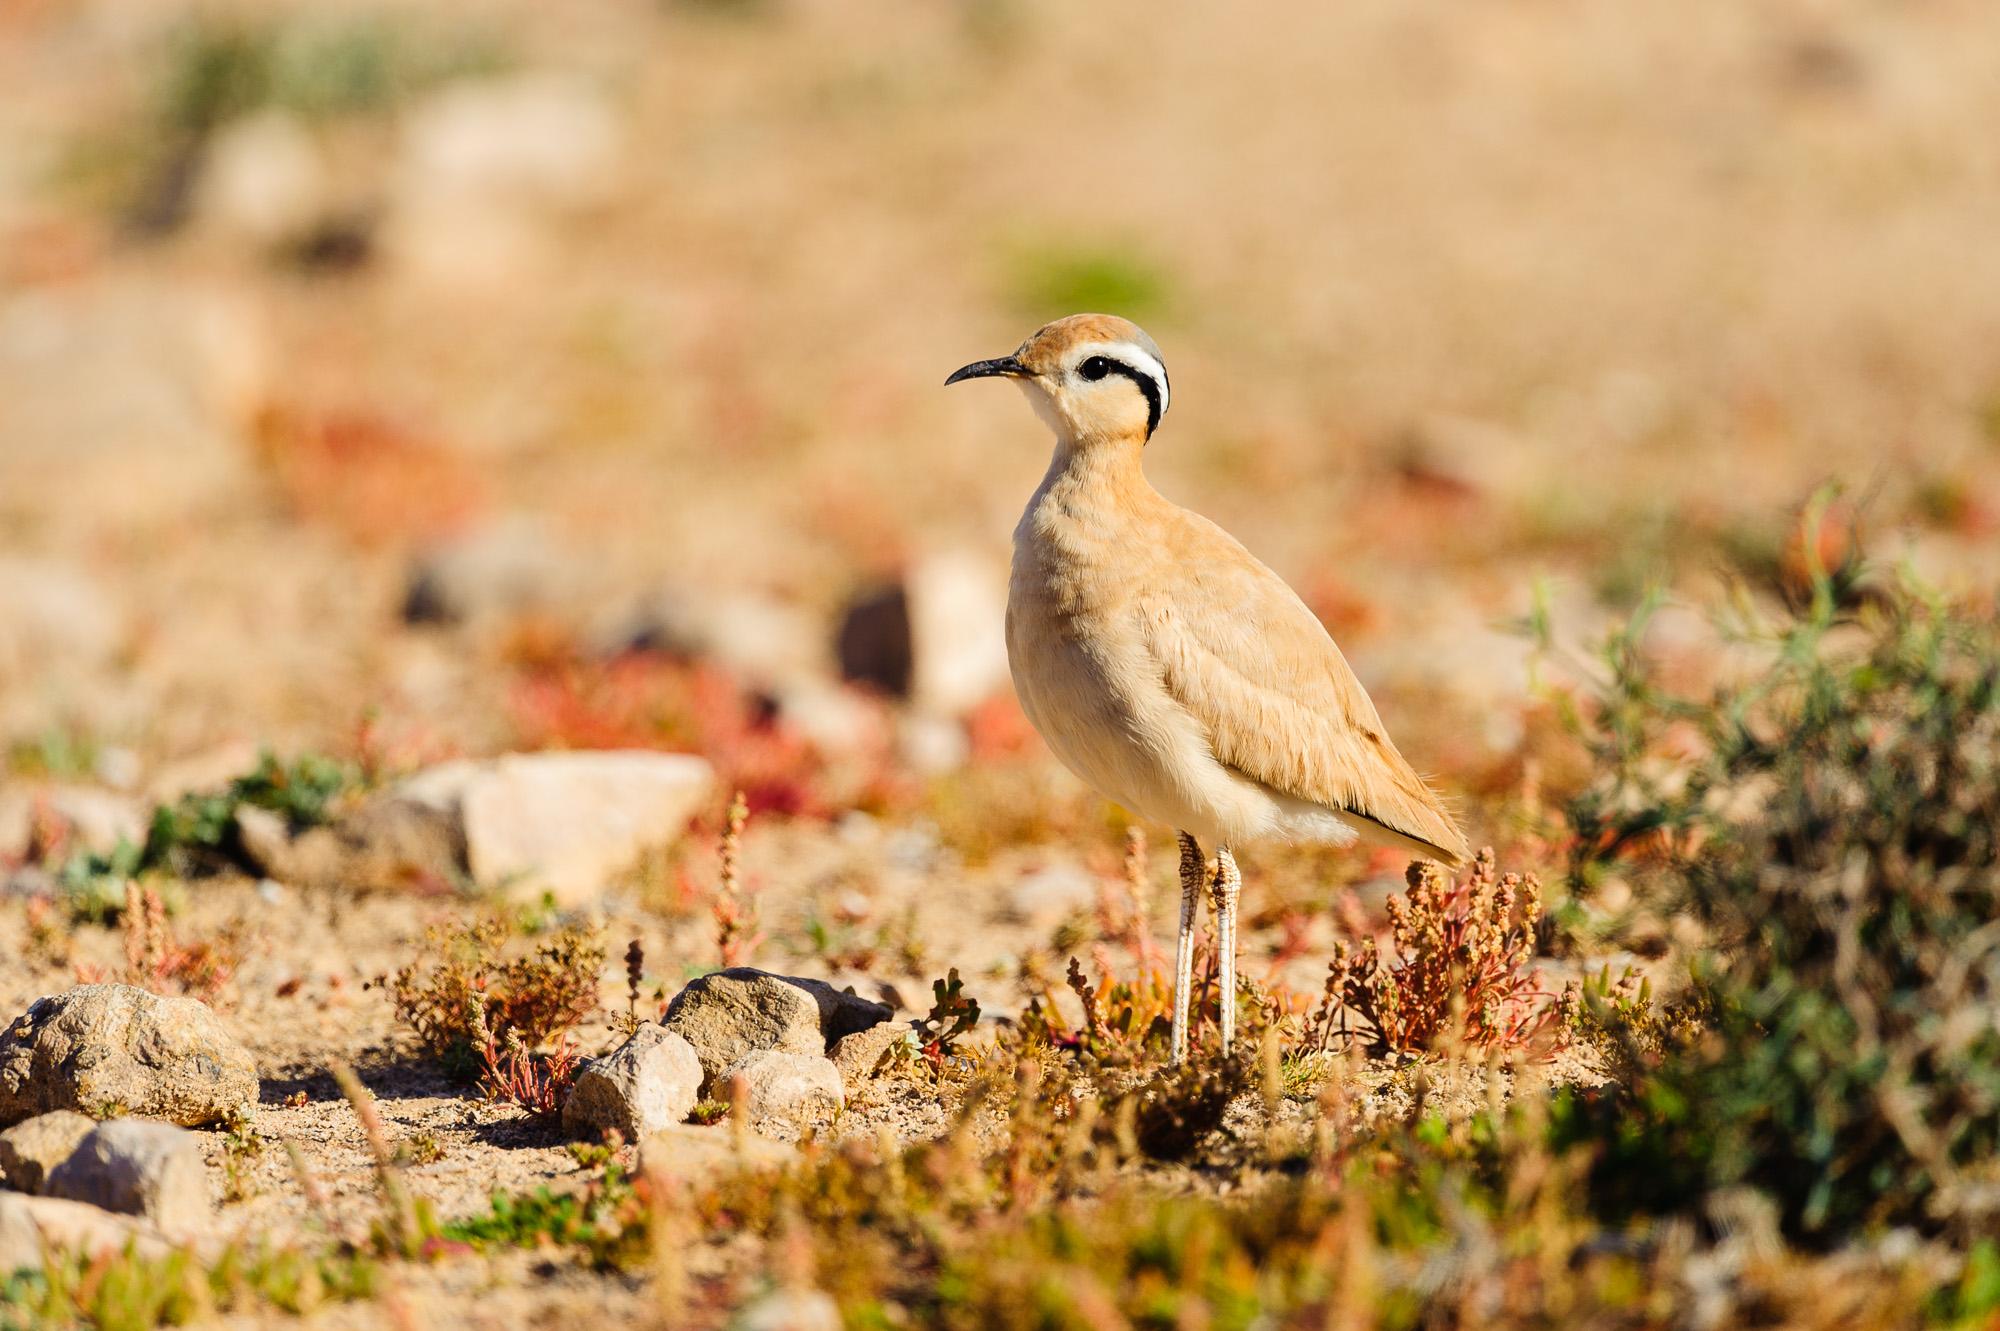 Corredor sahariano (Cursorius cursor)